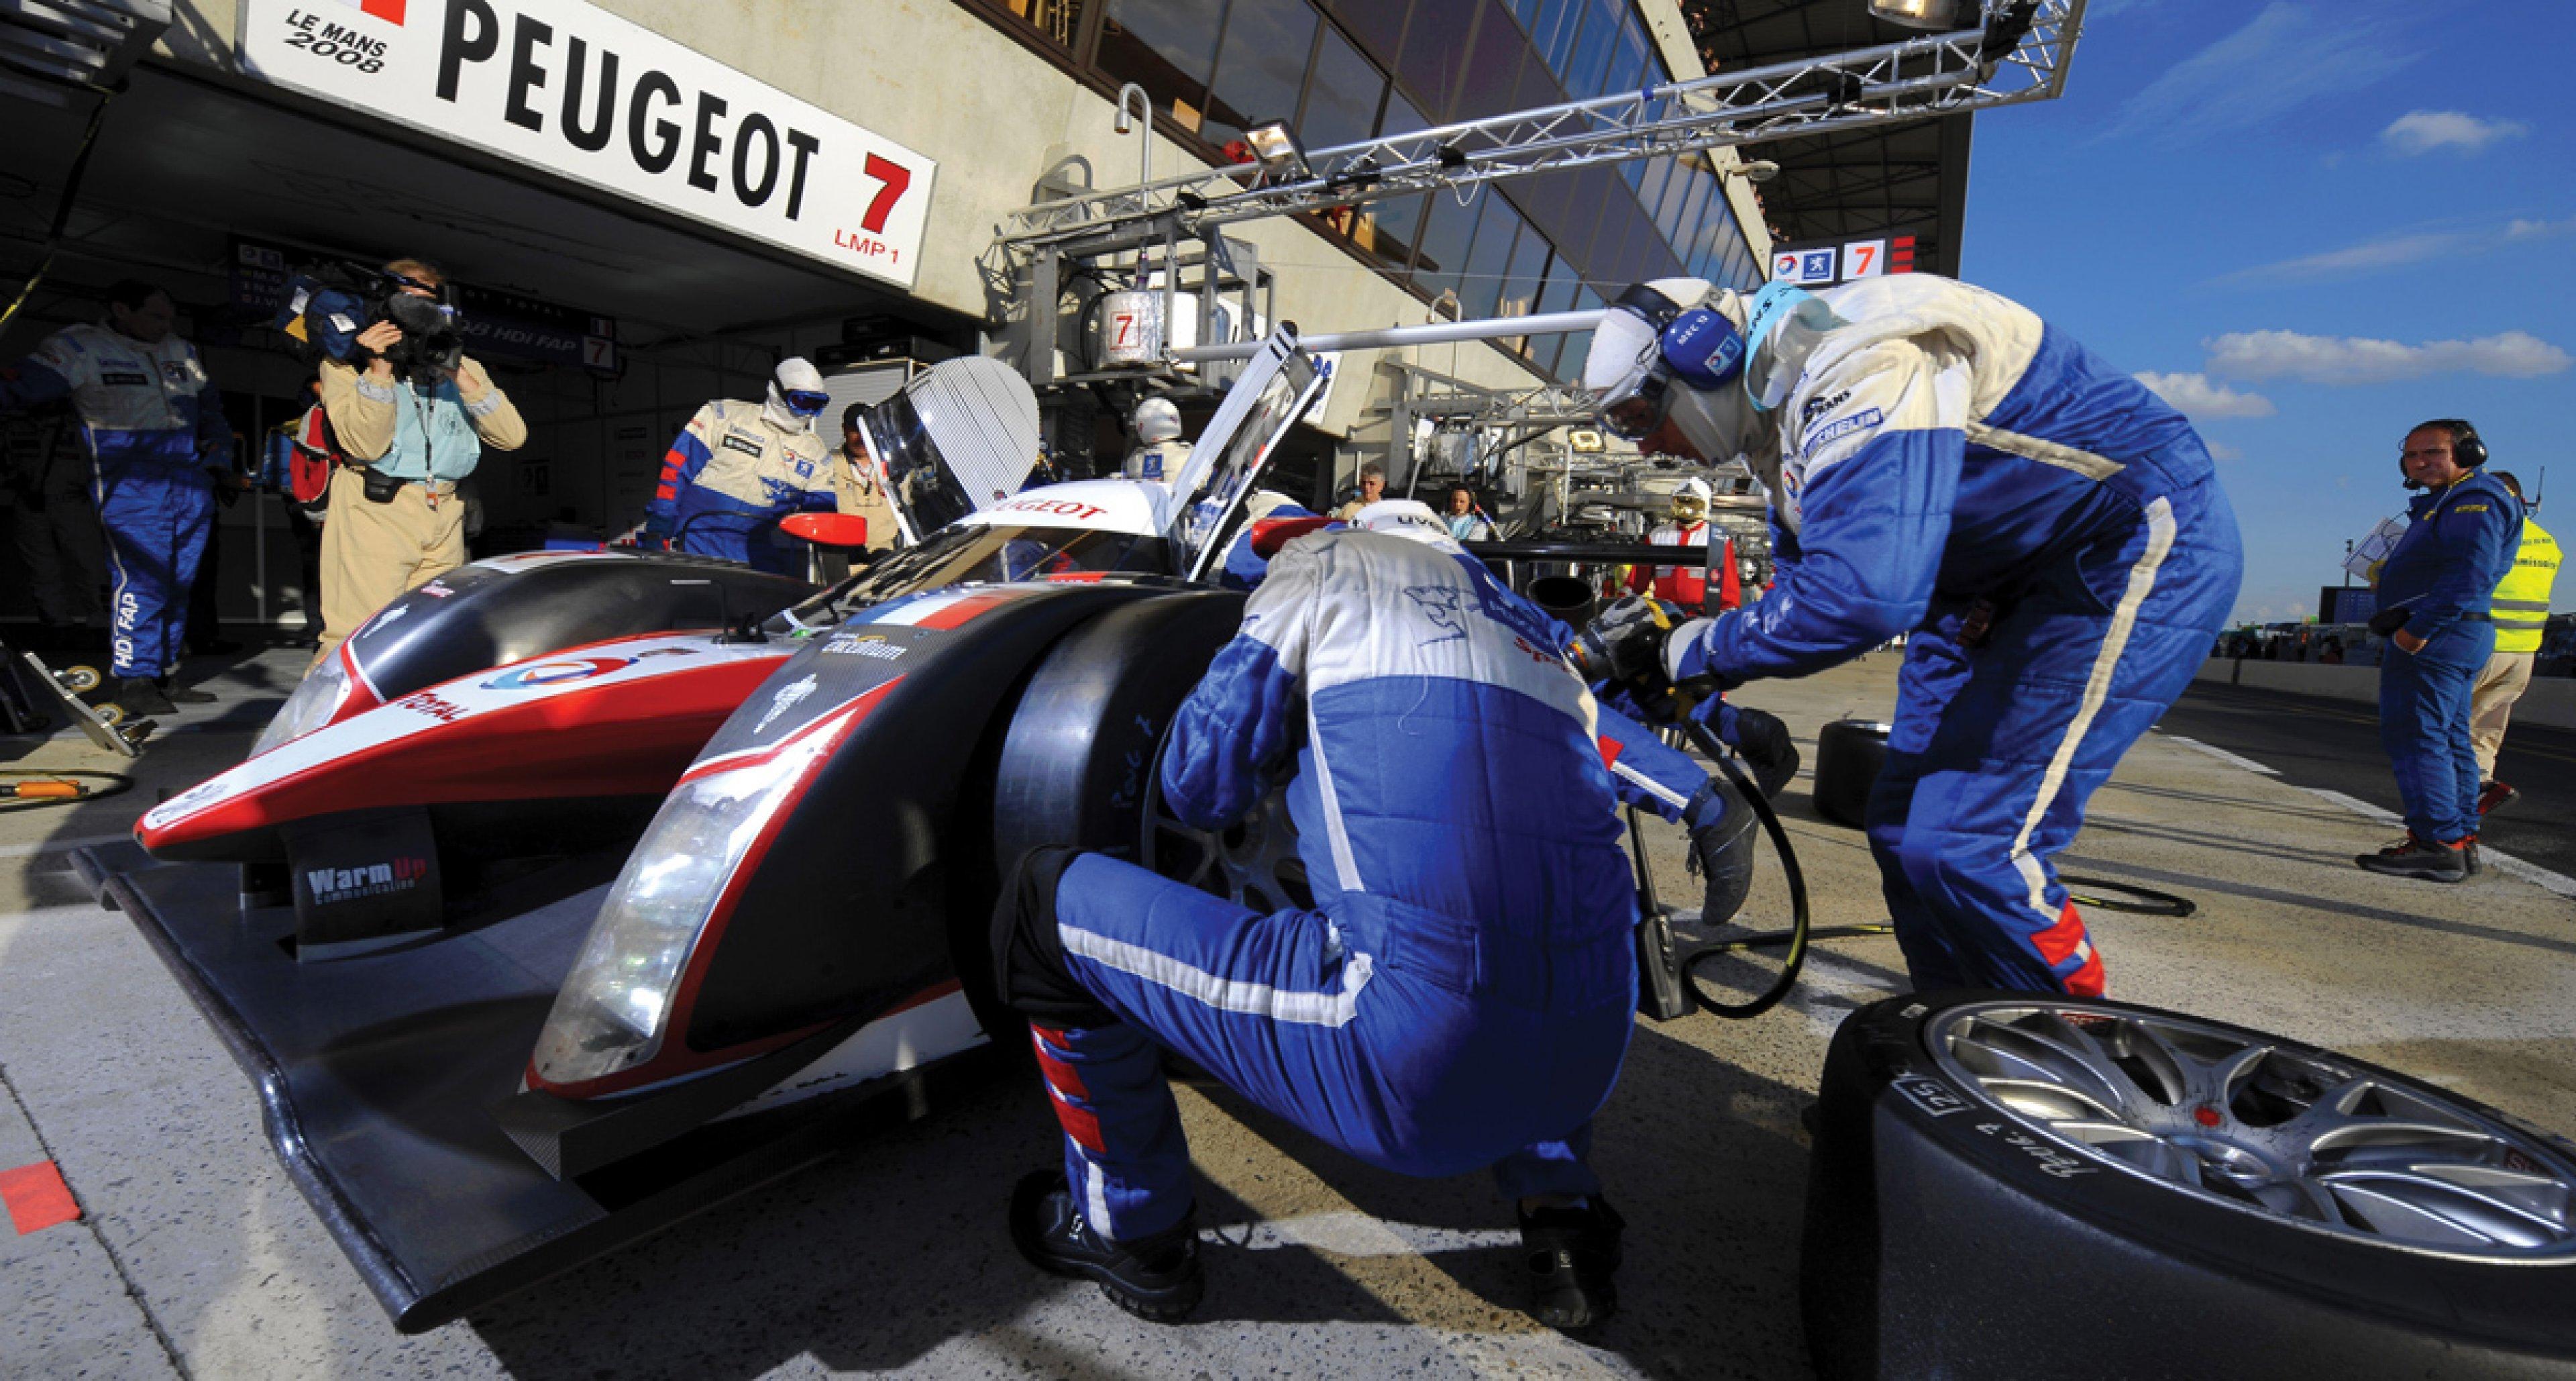 Lot 34: 2008 Peugeot 908 HDi FAP Le Mans Prototype € 1.400.000 - 1.800.000